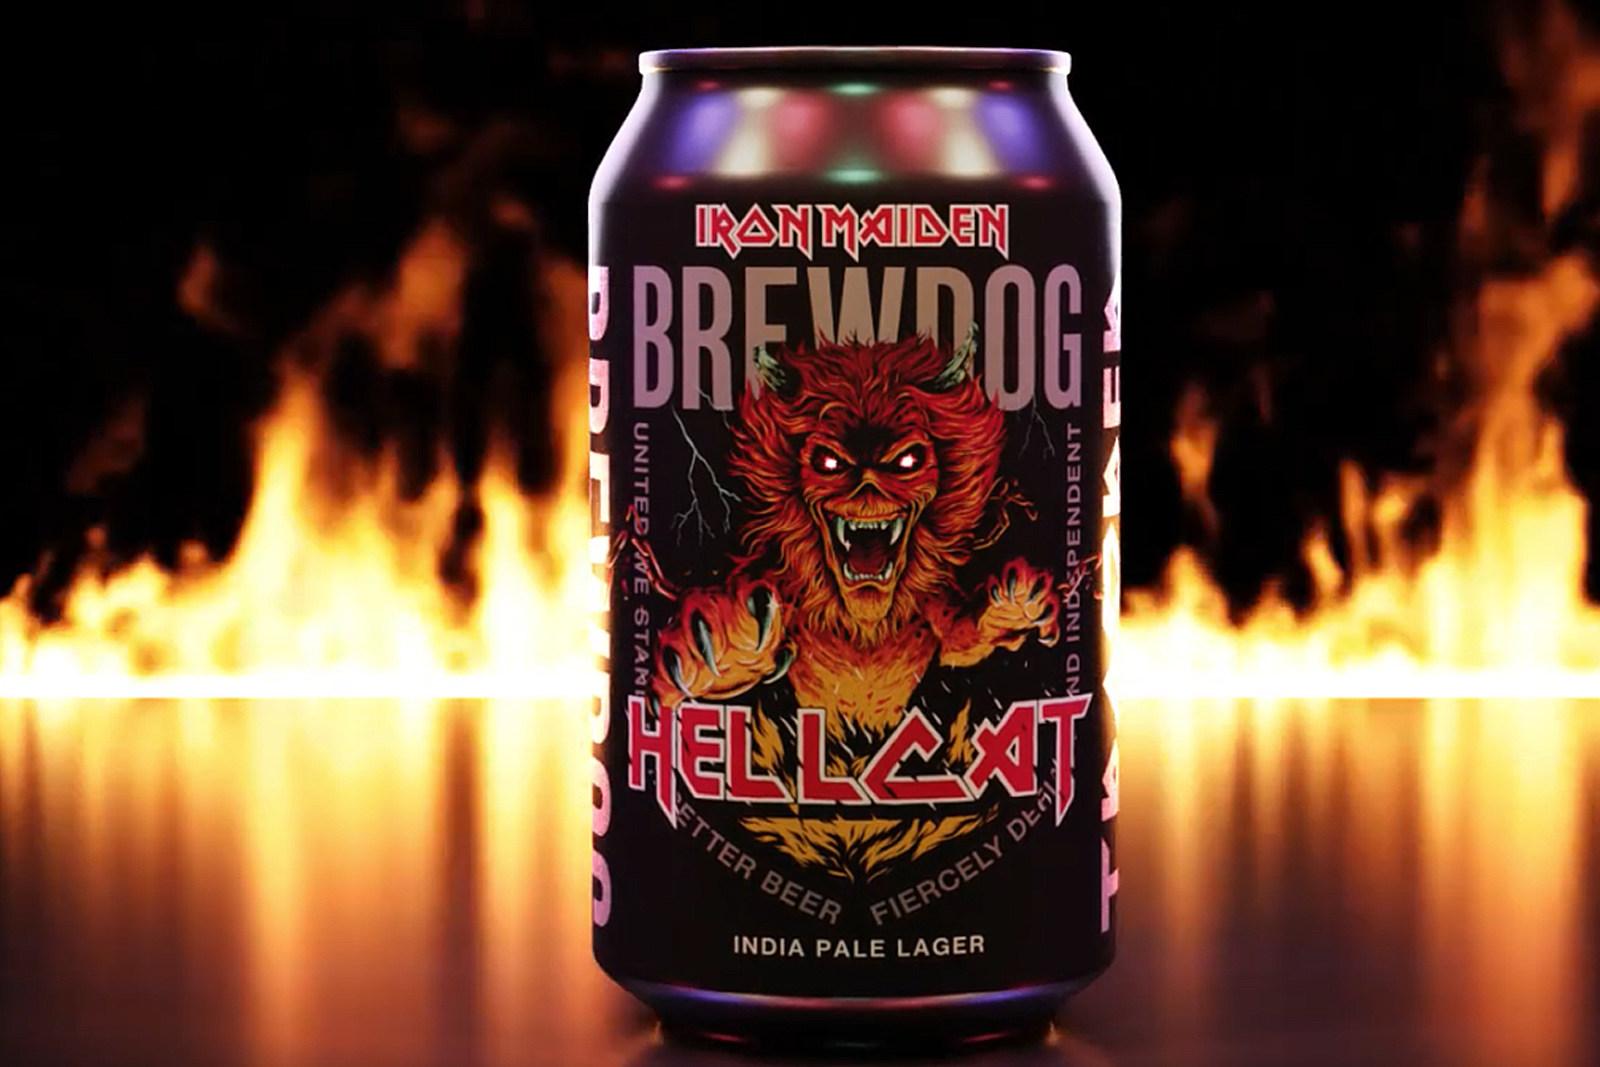 Iron Maiden Announce New Craft Beer, Hellcat